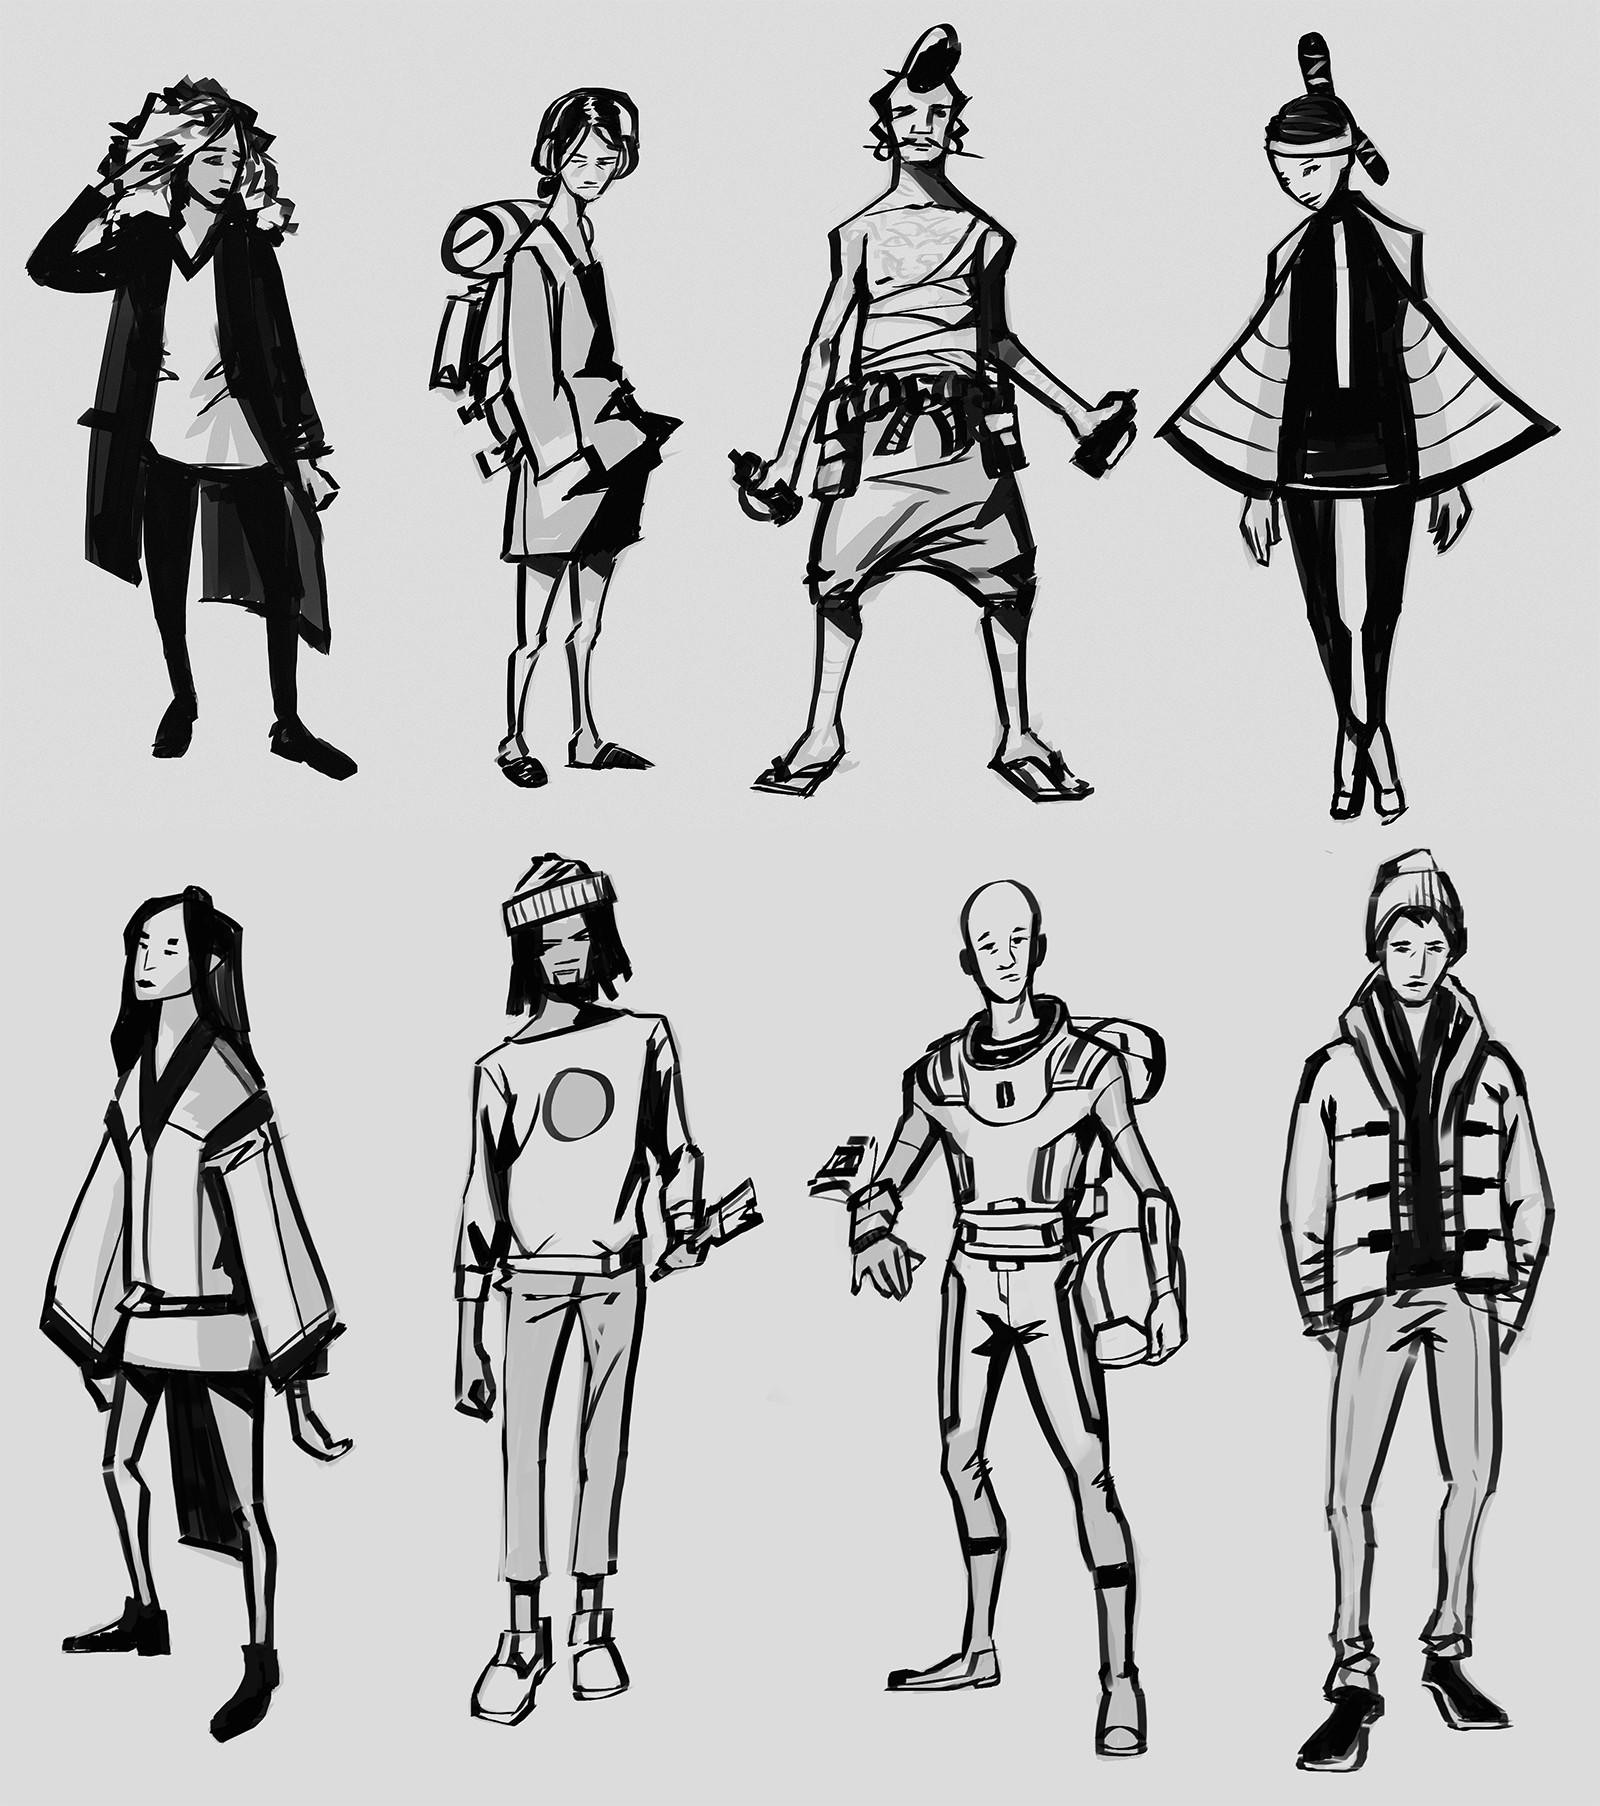 Izaak moody project canterbury characters